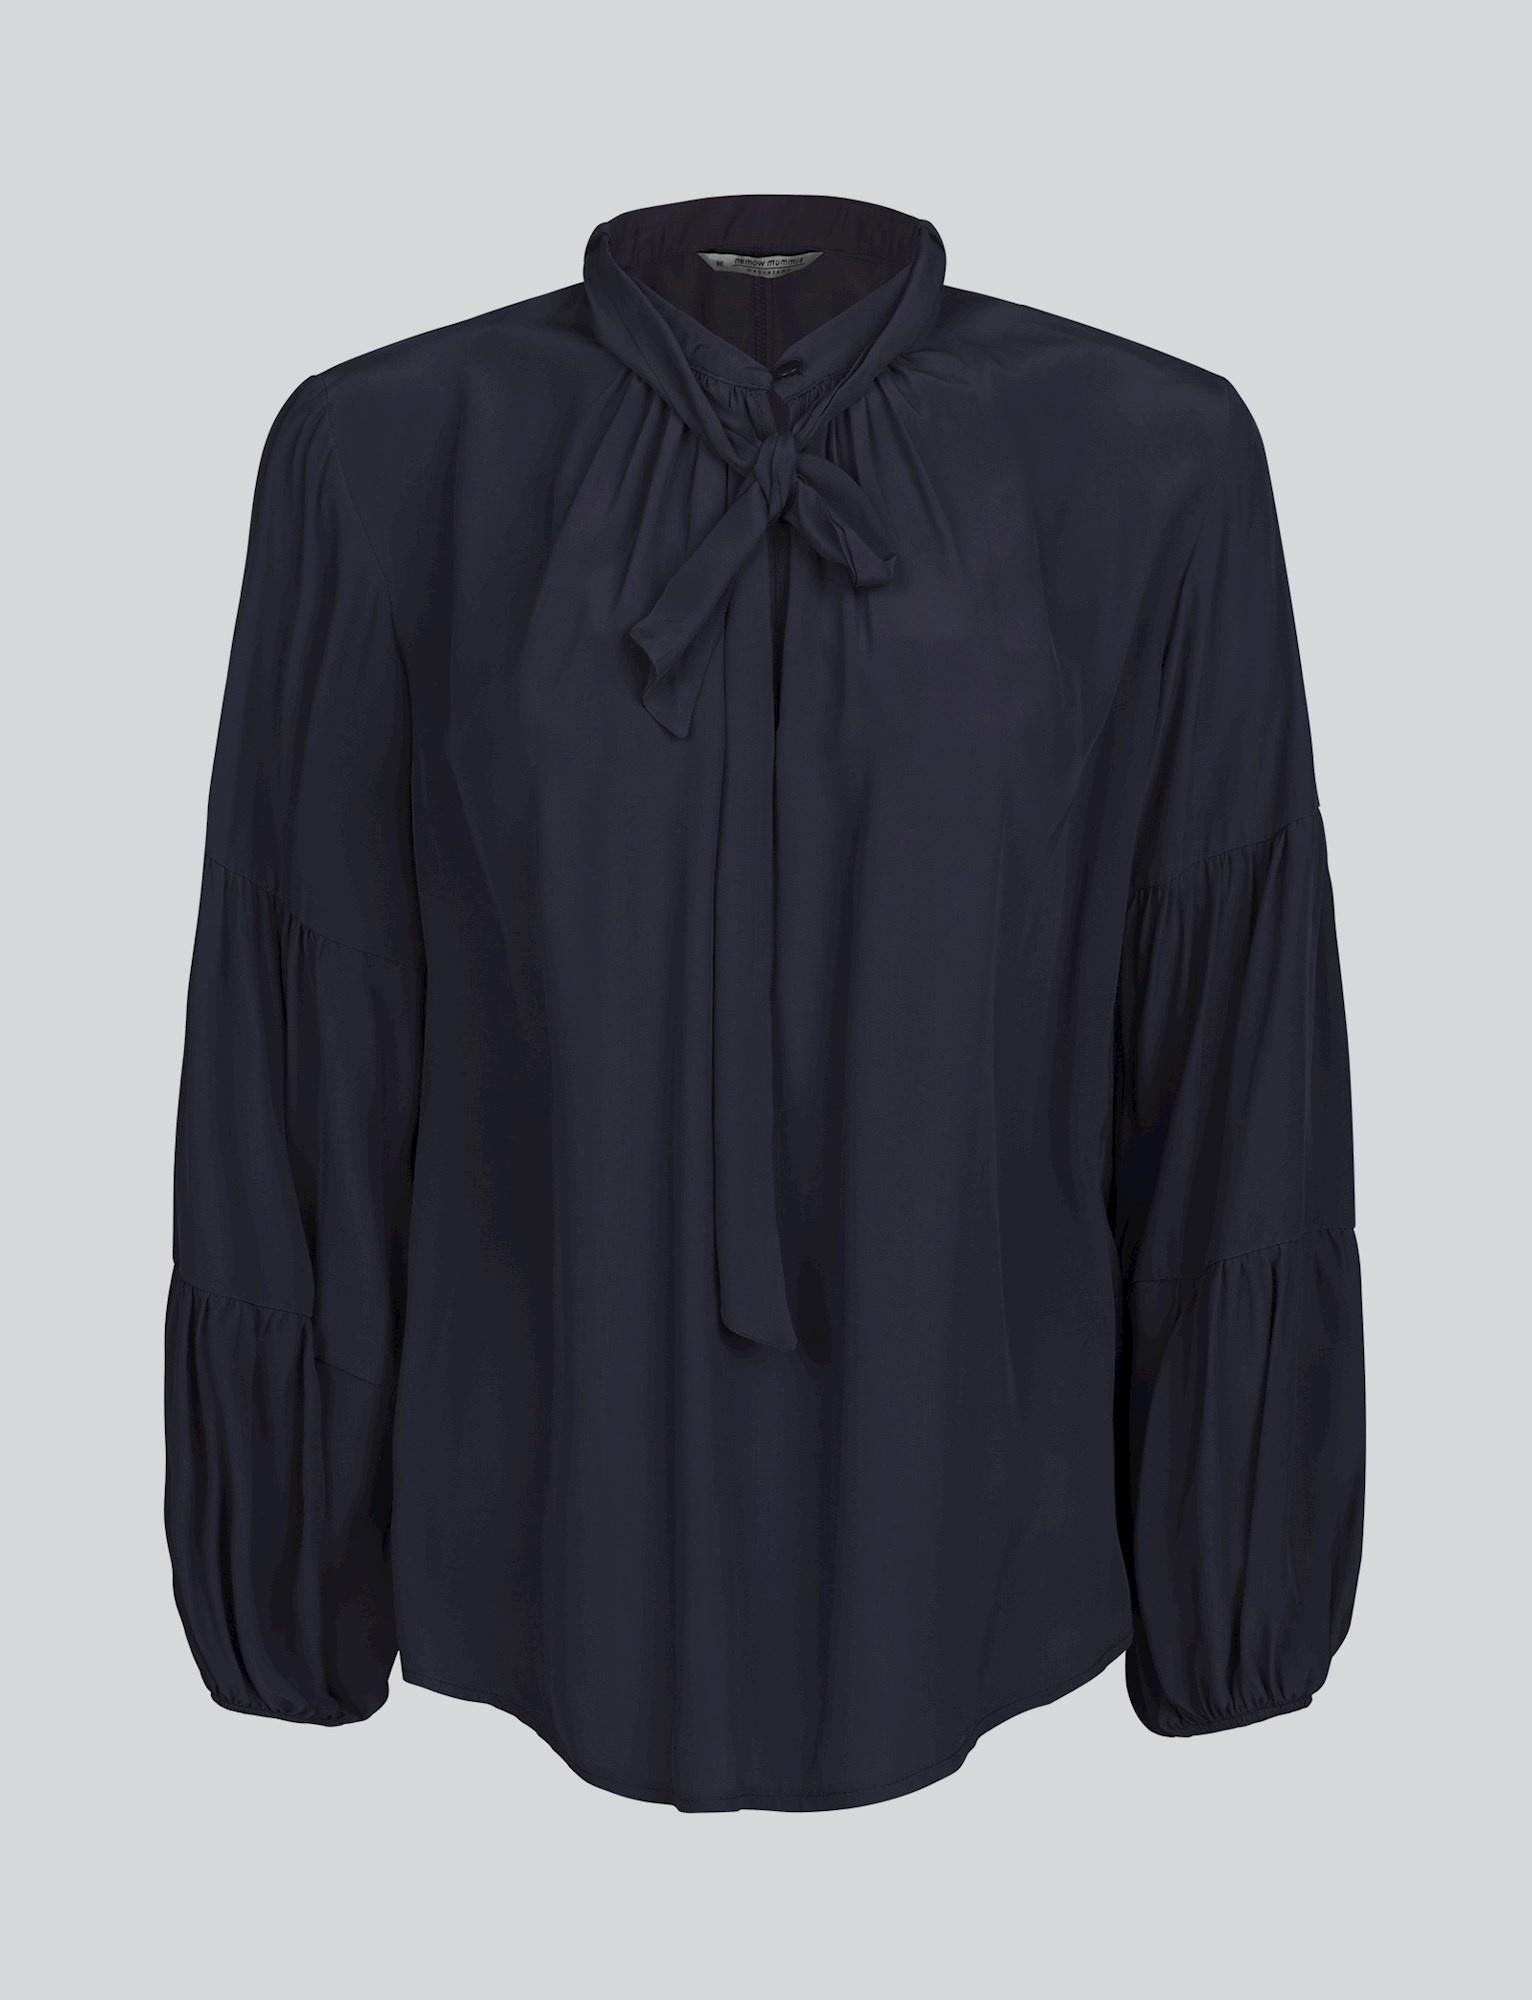 Summum blouse 2S2632-11508-1